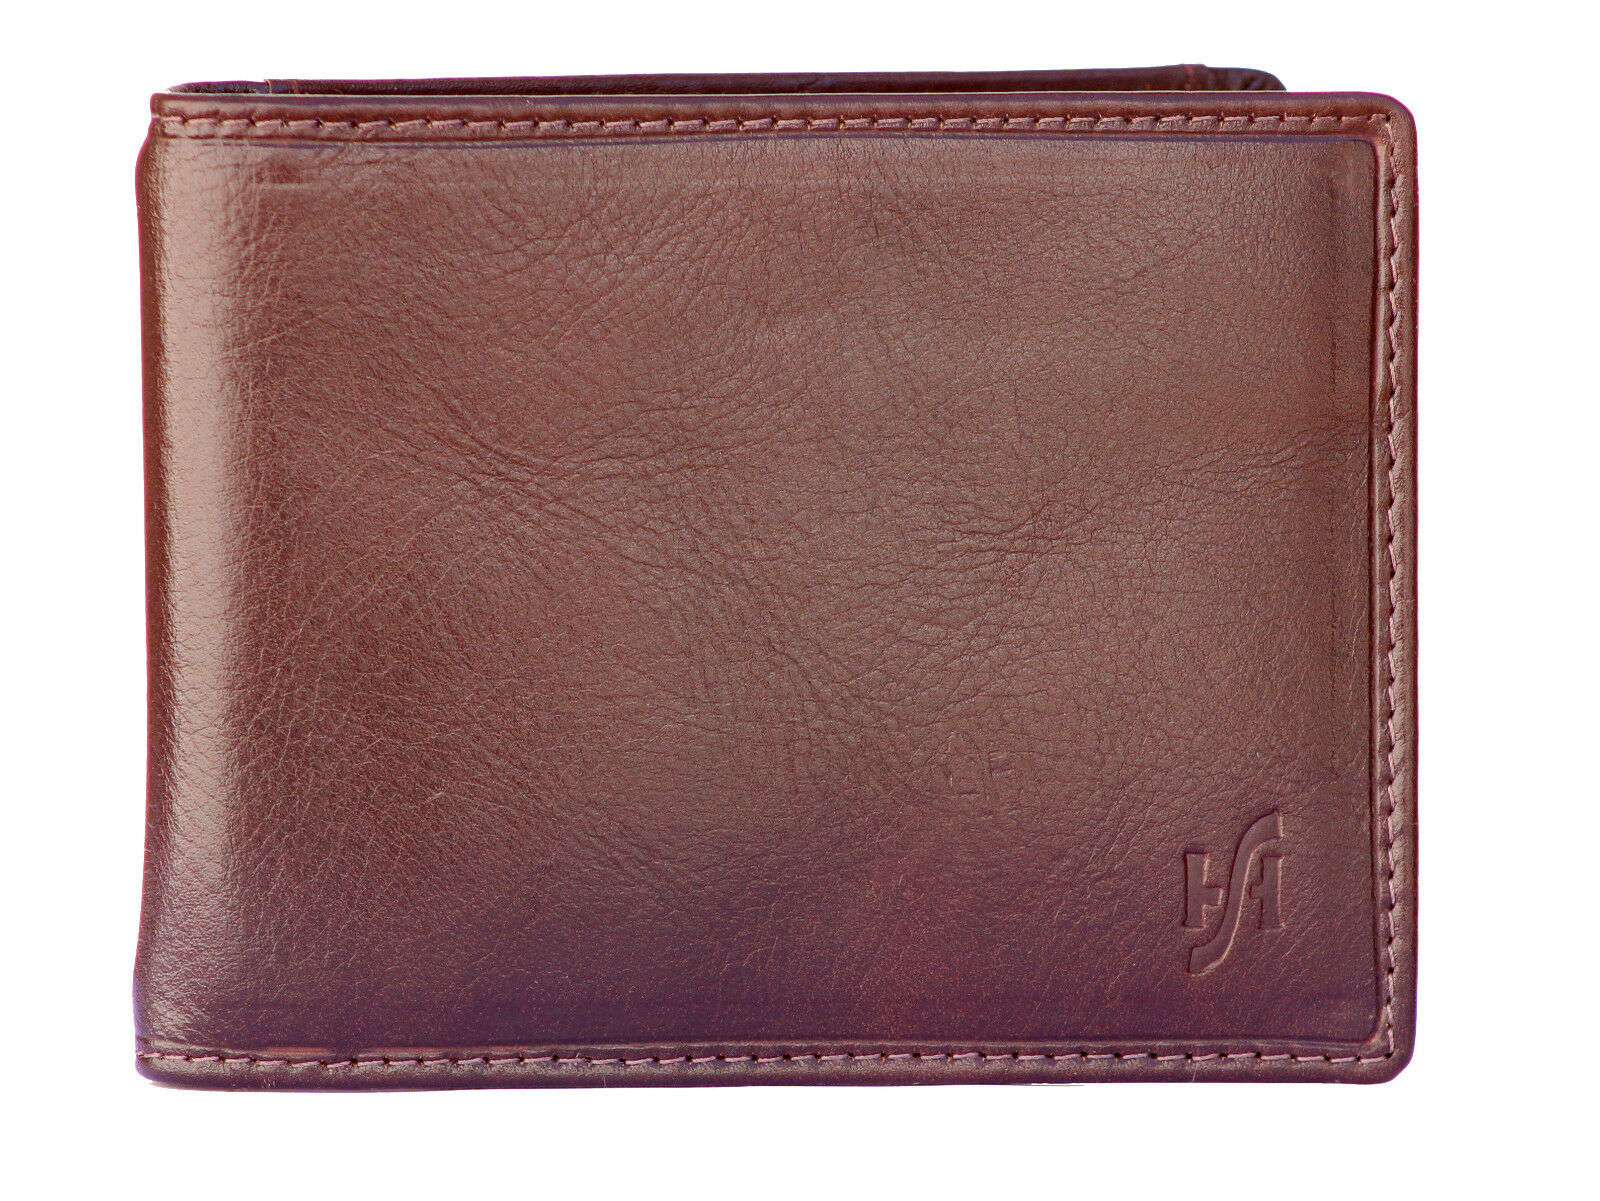 Mens RFID Bifold Money Clip Card Wallet Brown